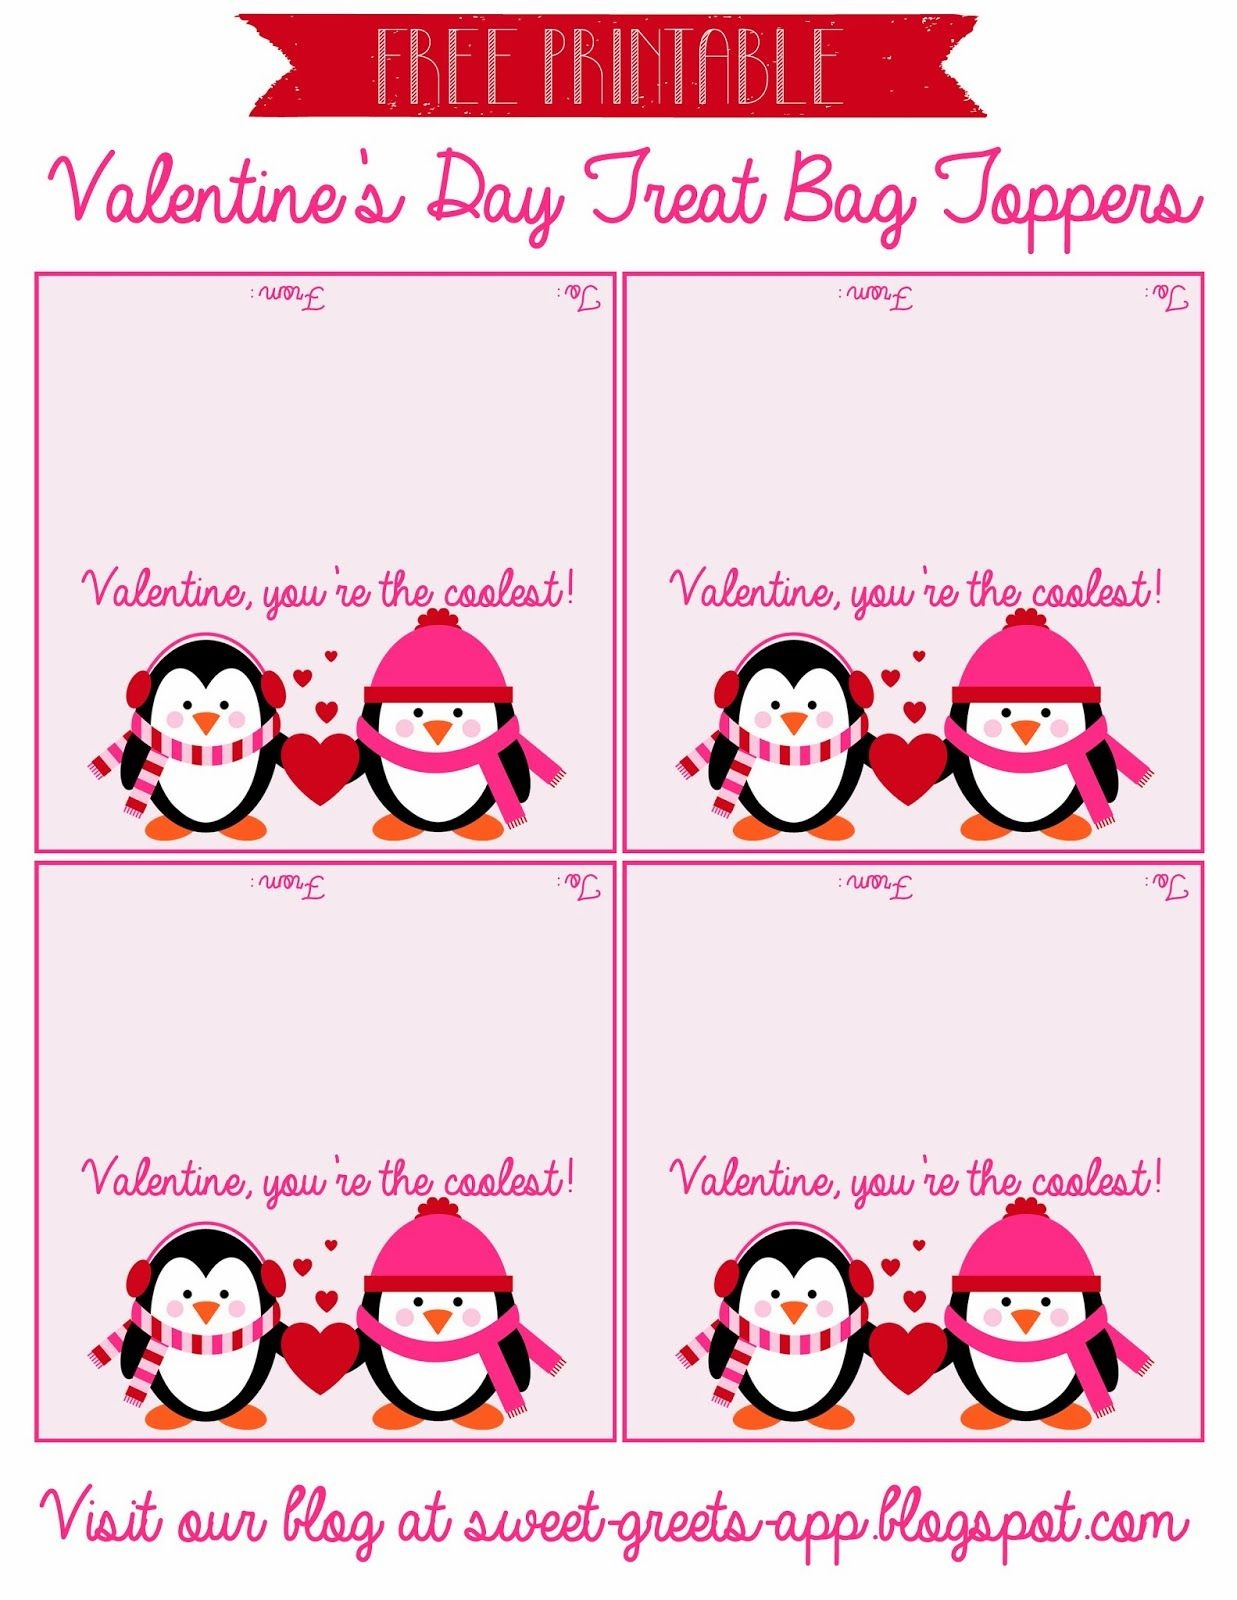 Free Printable Valentine's Day Treat Bag Toppers   Valentine's Day - Free Printable Bag Toppers